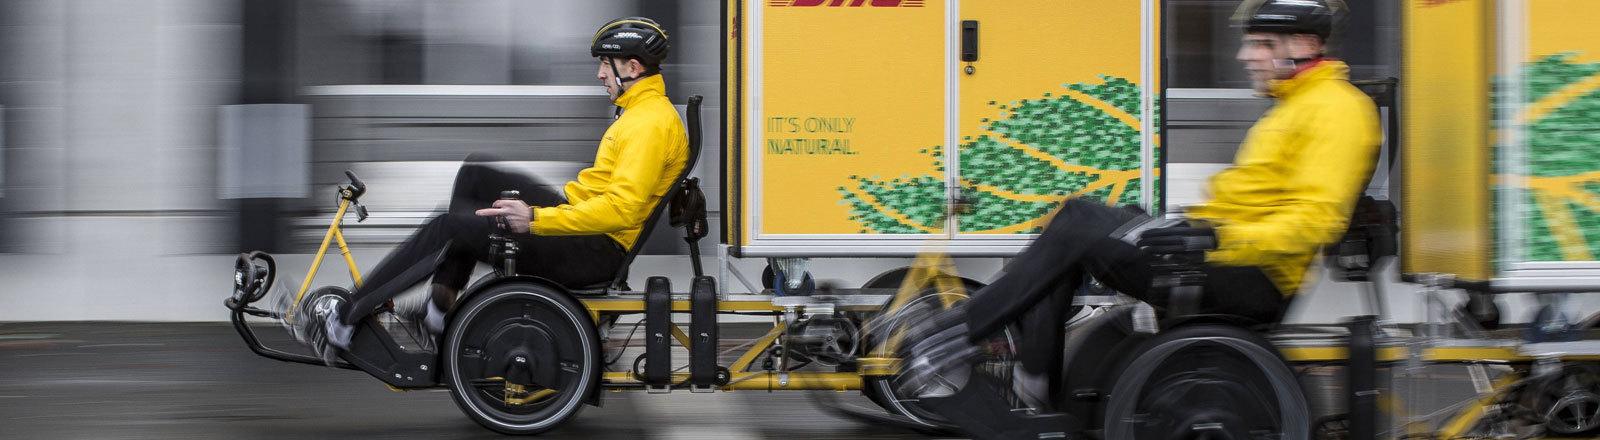 PK Deutsche Post beginnt mit City-Hub-Projekt in Frankfurt, Berlin